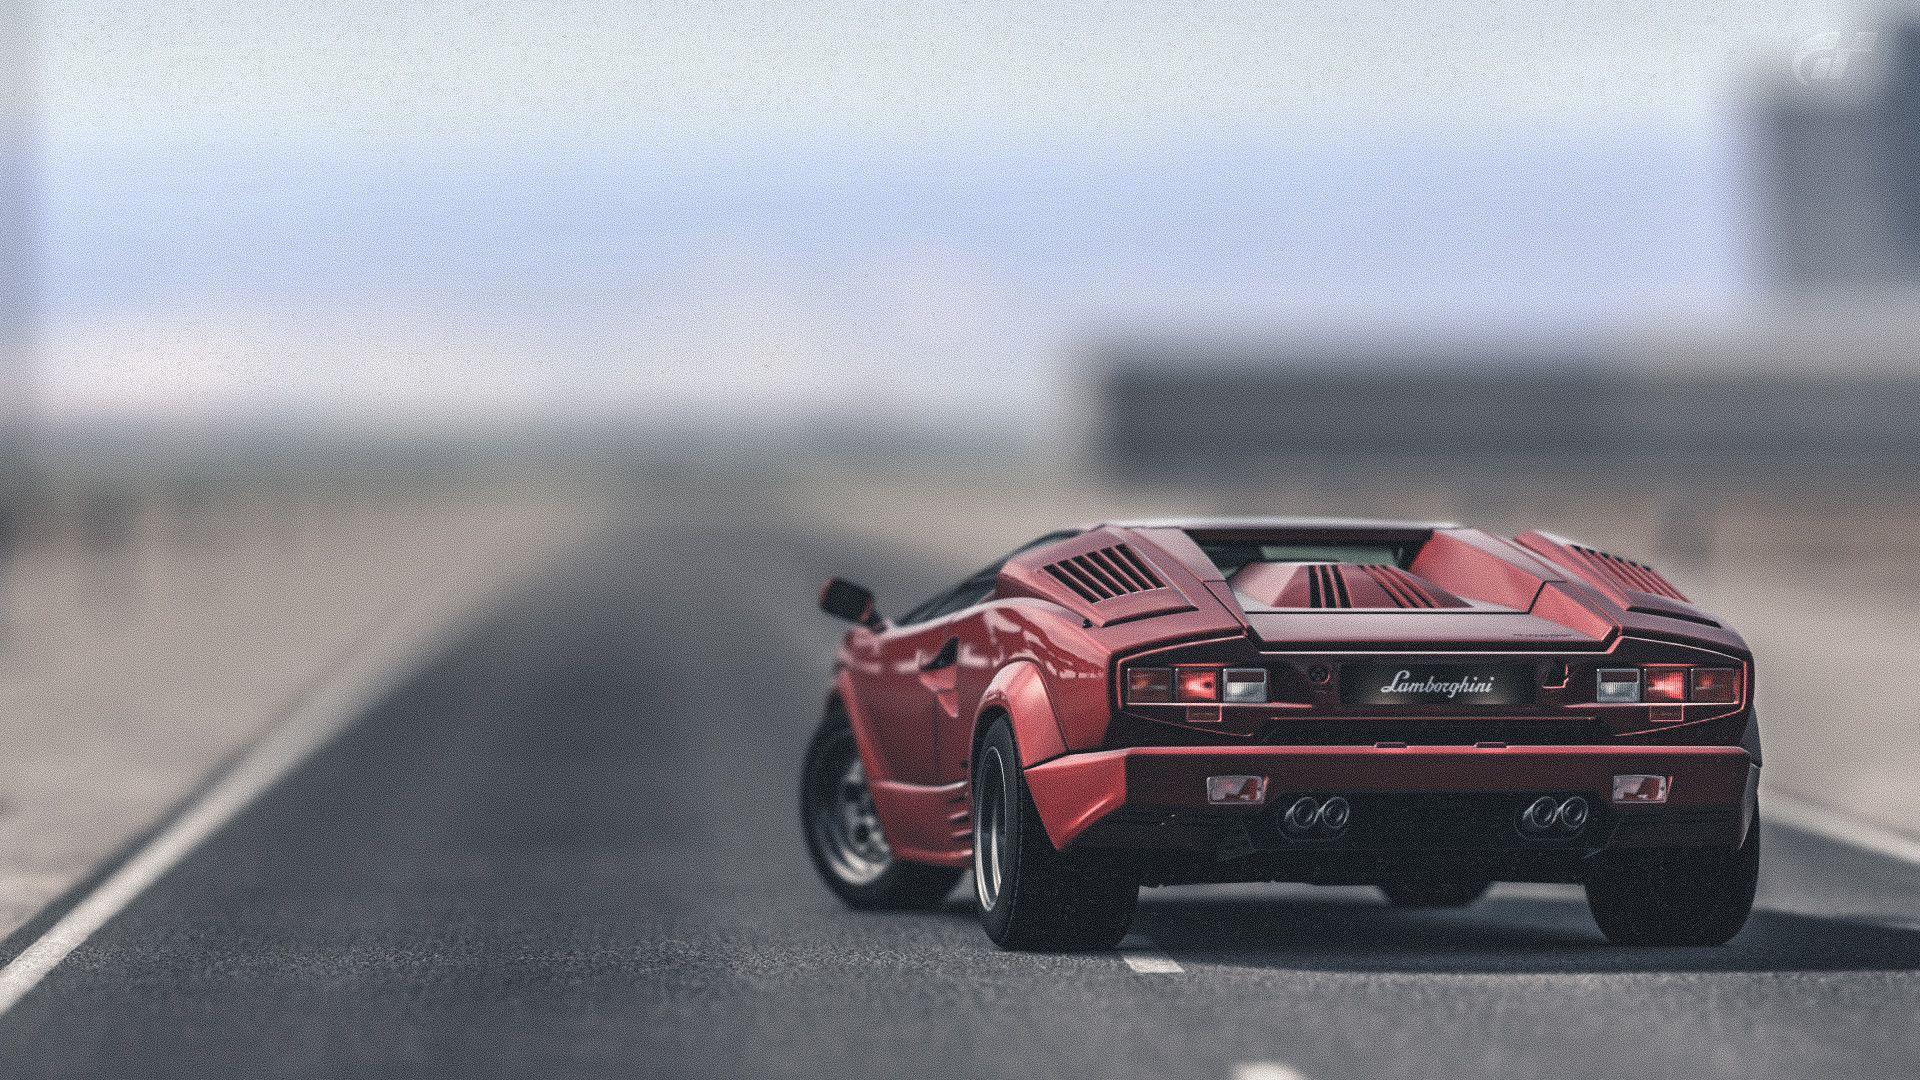 Lamborghini Countach Wallpapers , Wallpaper Cave